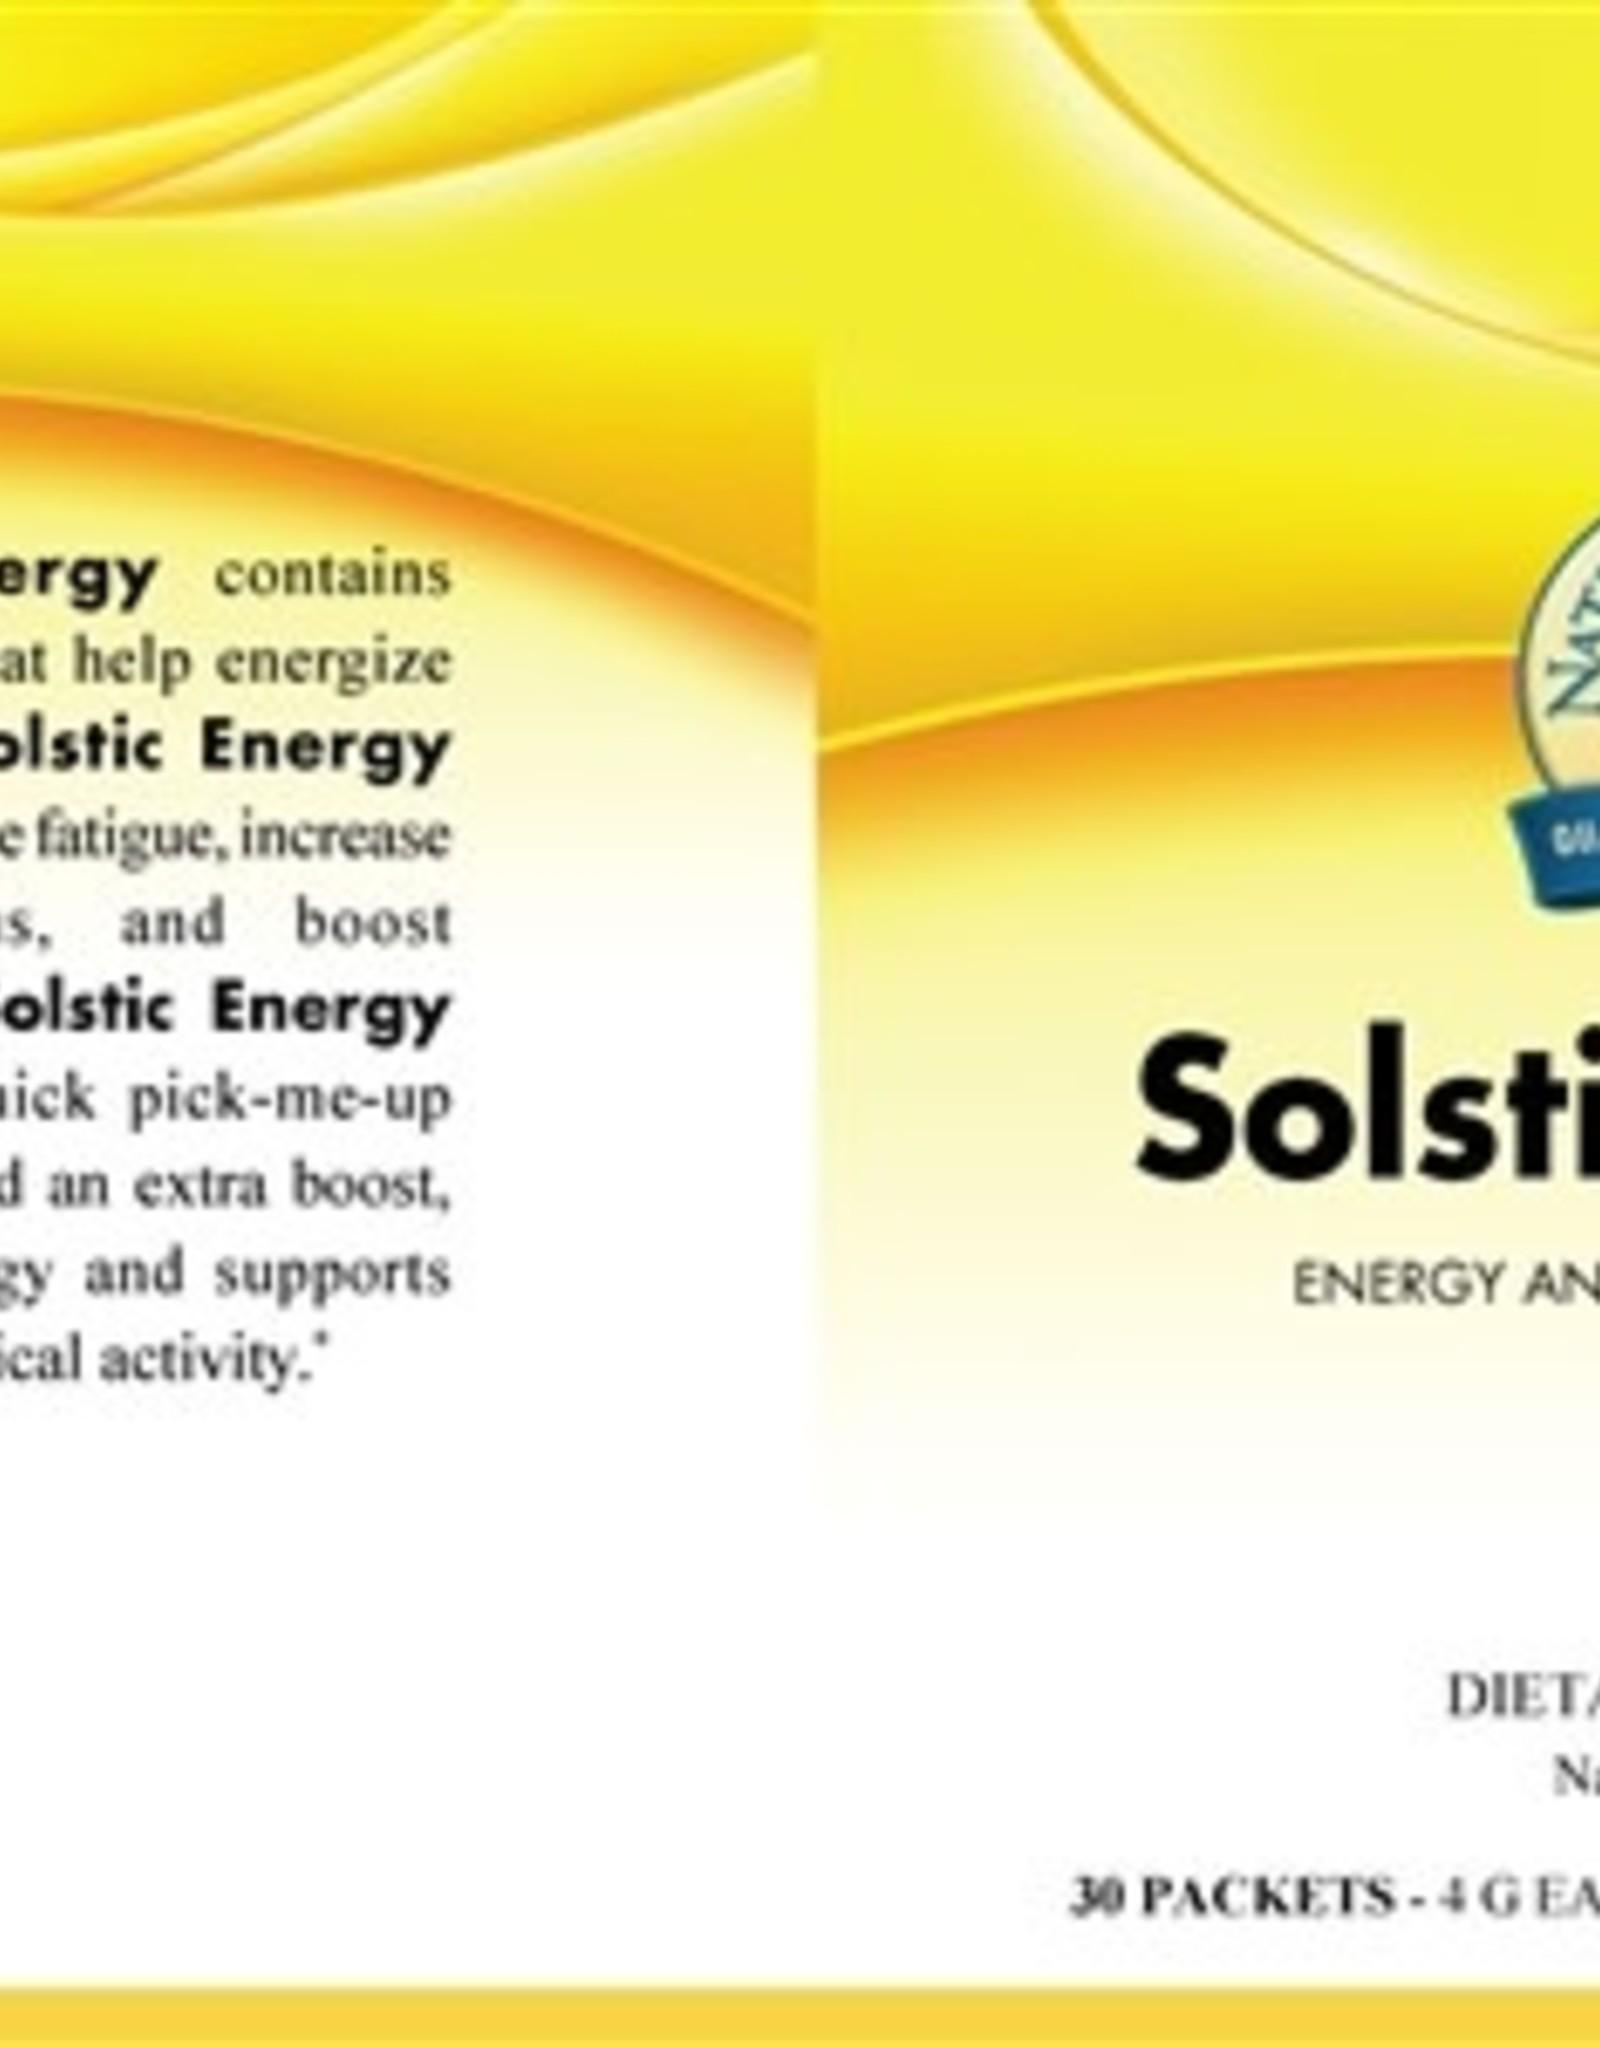 Nature's Sunshine Solstic Energy (1 packet) single